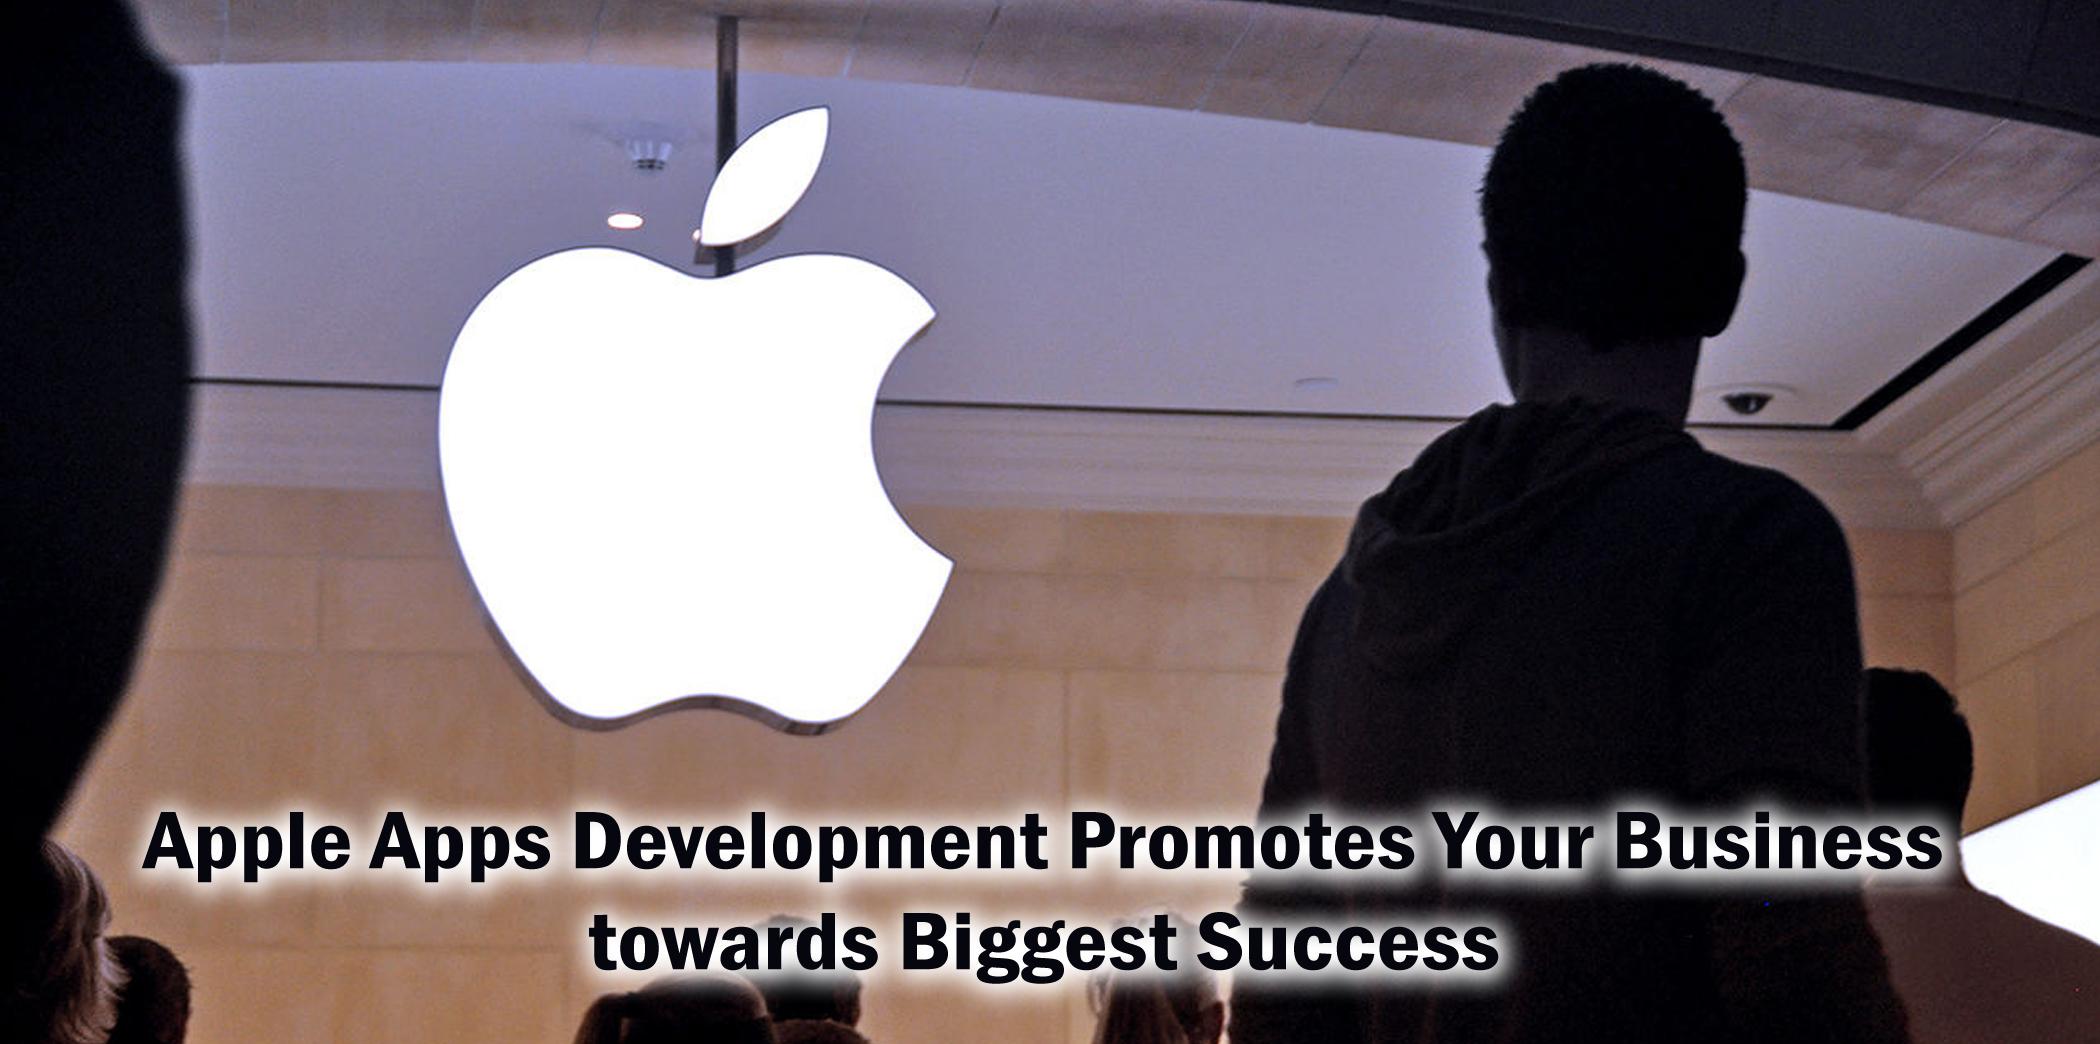 Apple Apps Development Promotes Your Business towards Biggest Success